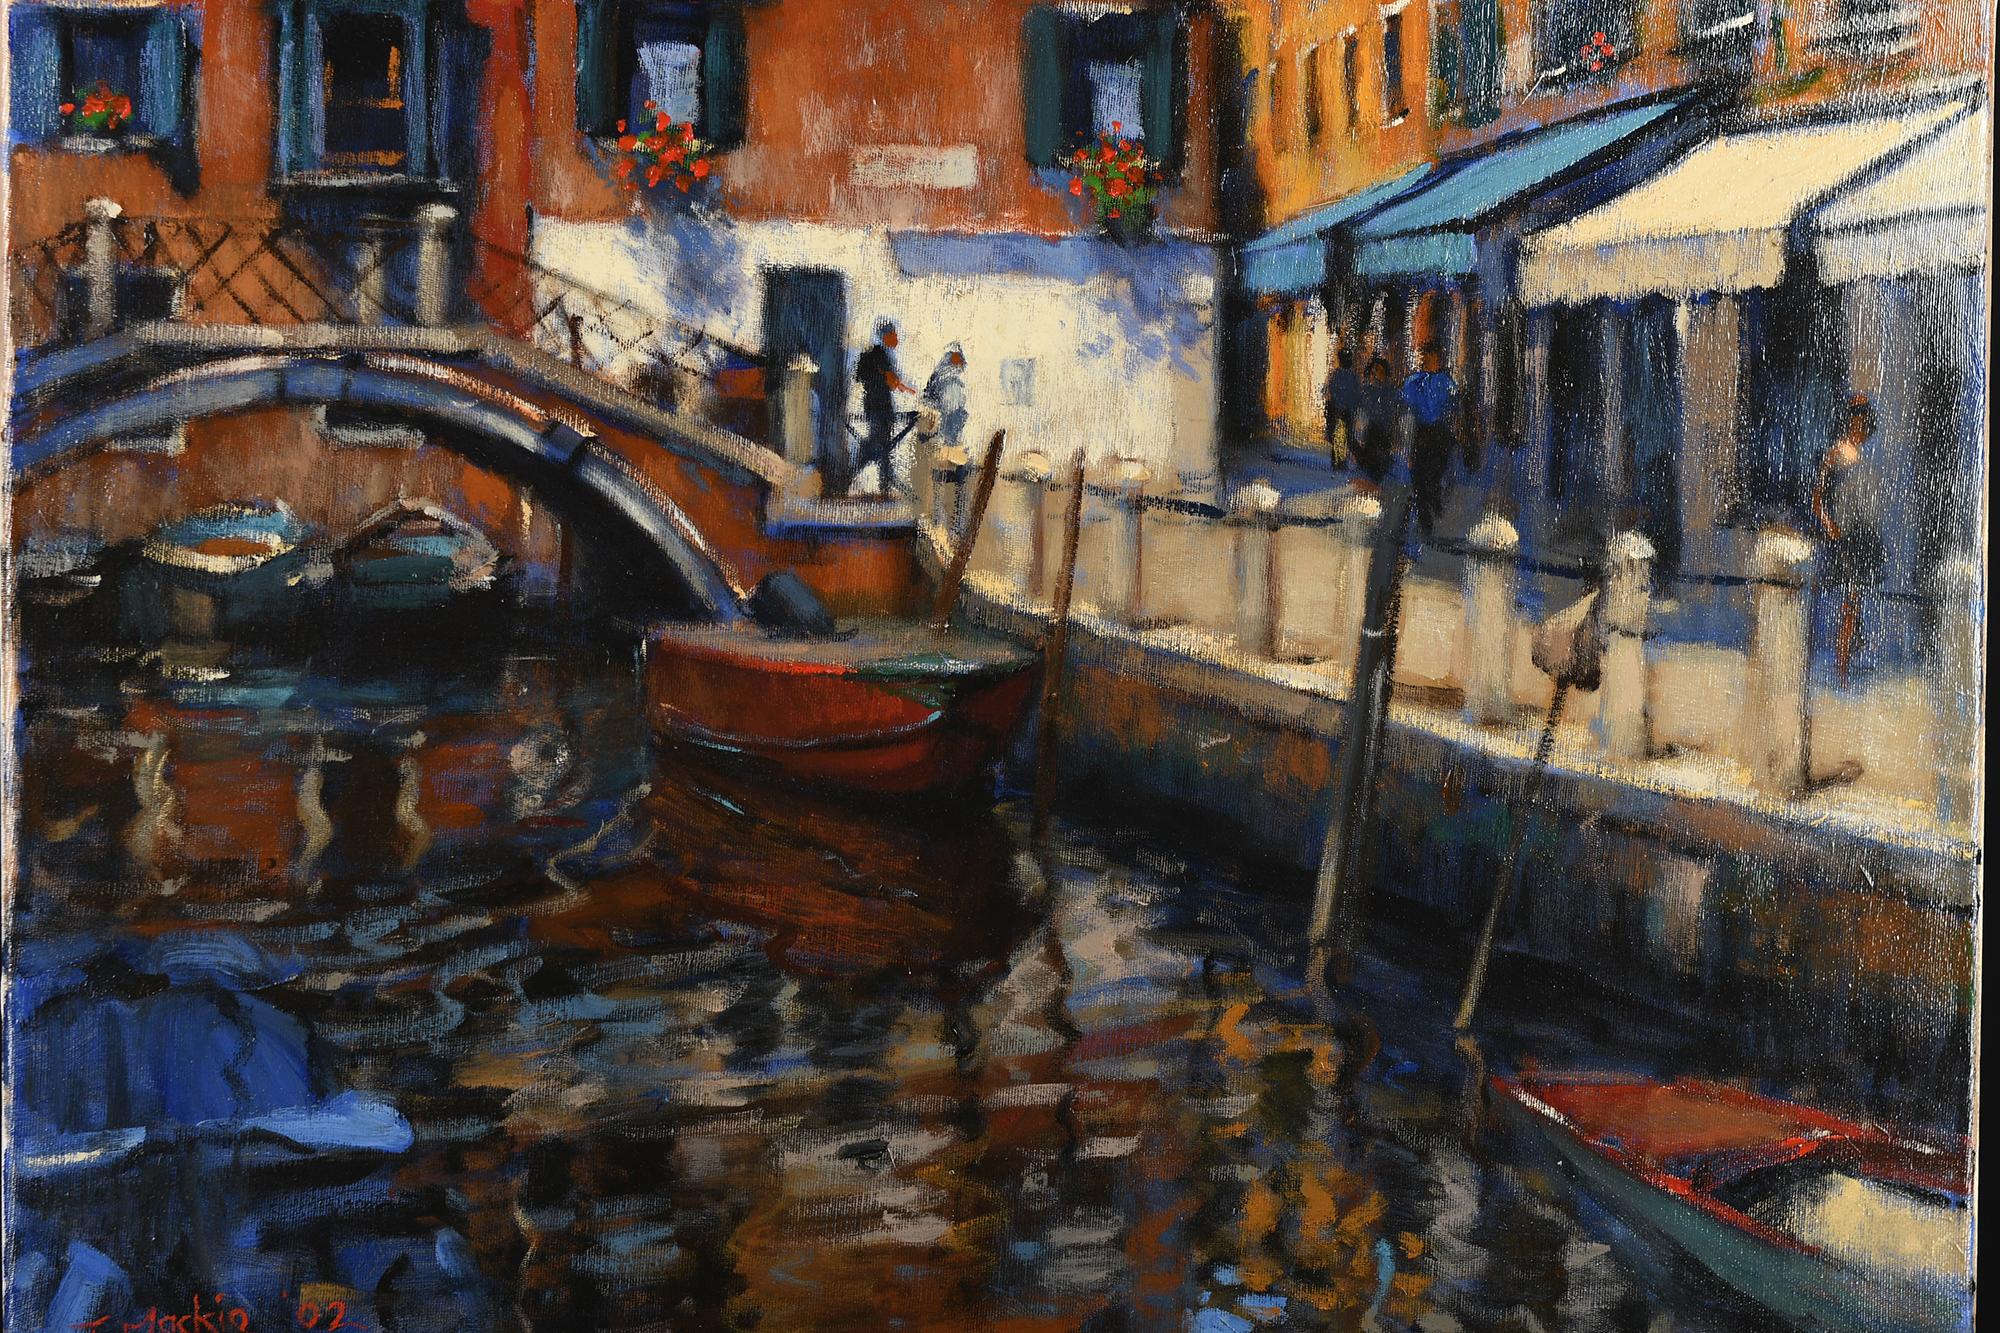 John Mackie original Painting - Image 3 of 6